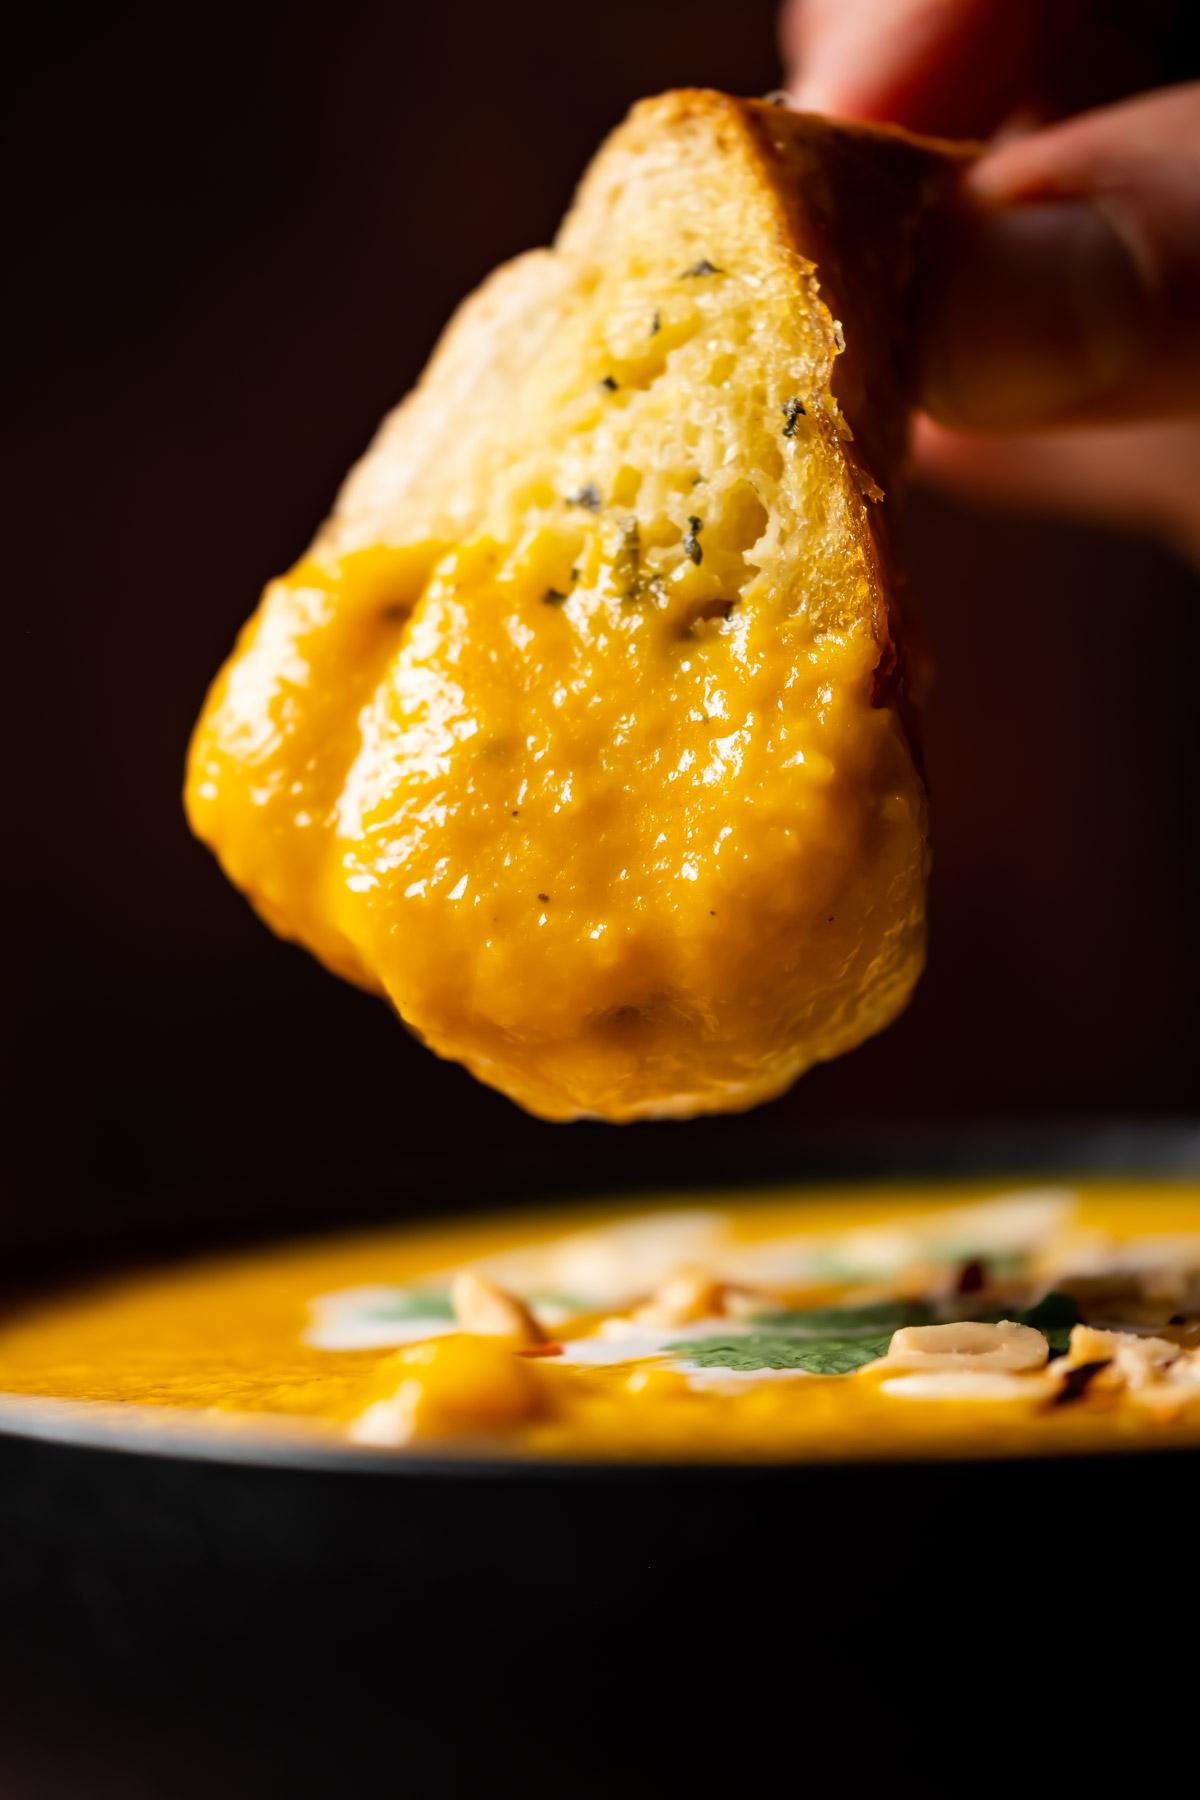 Garlic bread dipping into a bowl of Thai butternut squash soup.